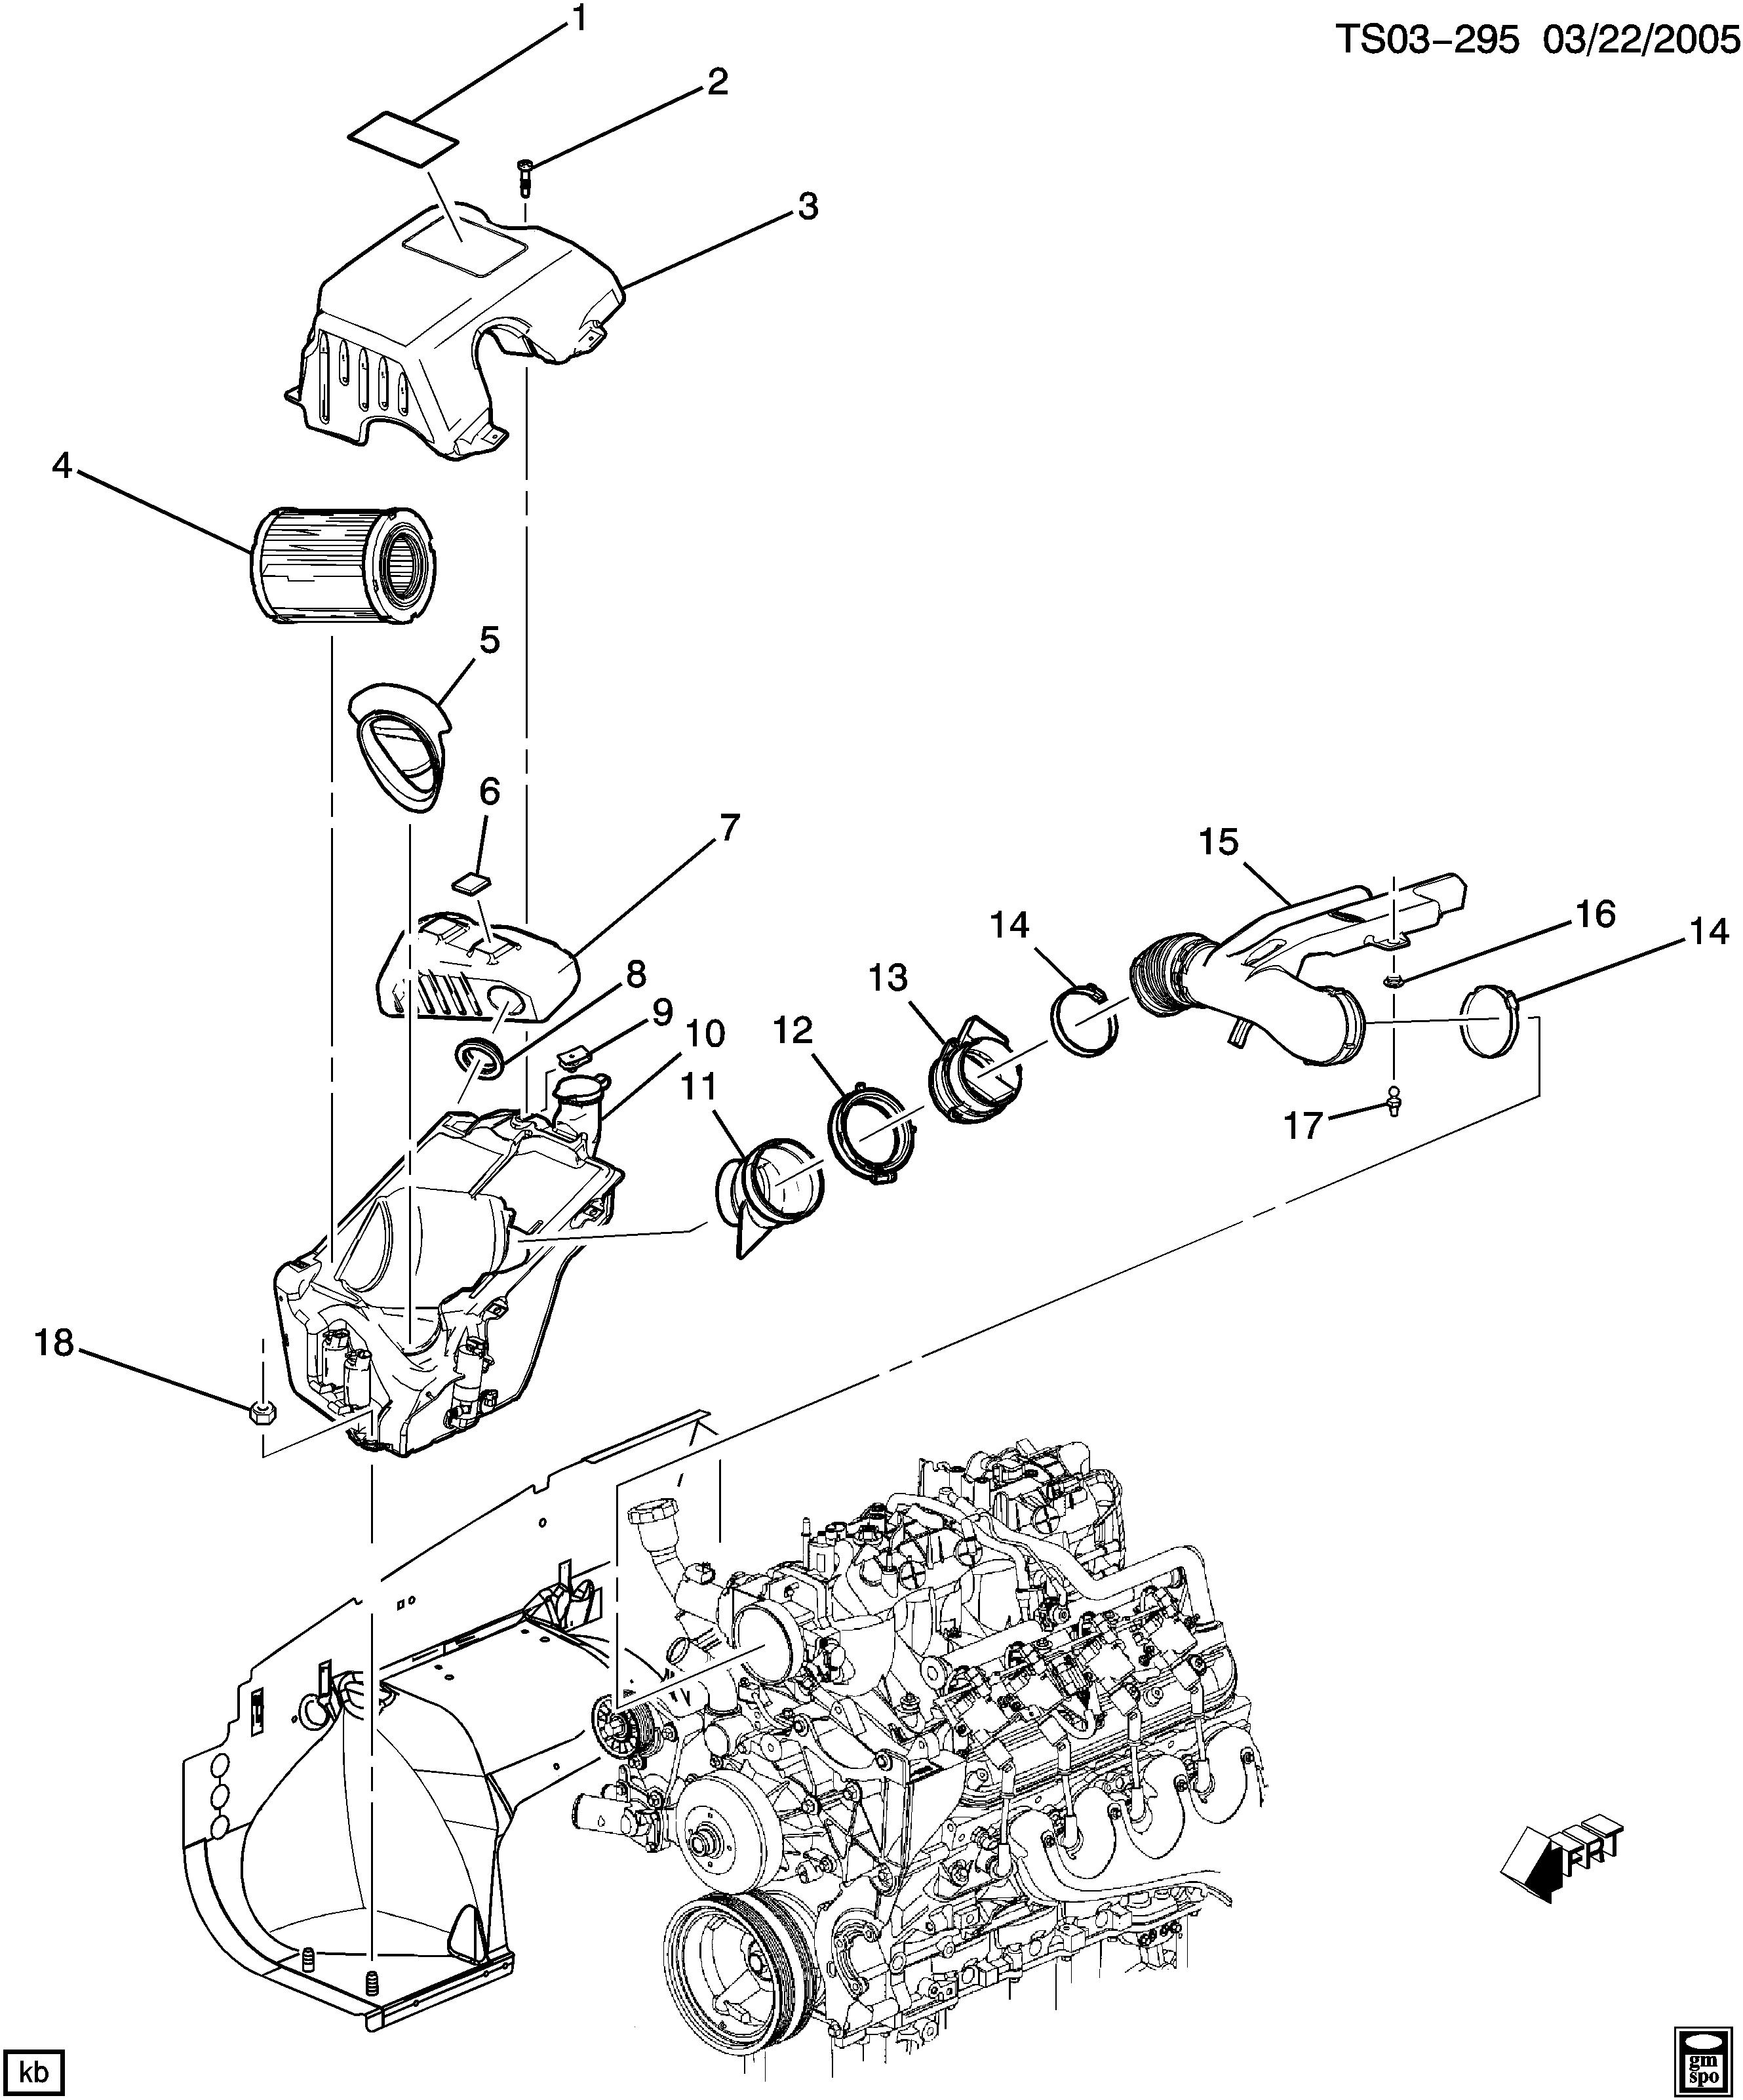 trailblazer 4wd air intake system chevrolet epc online nemiga Chevy Trailblazer Body Parts Diagram